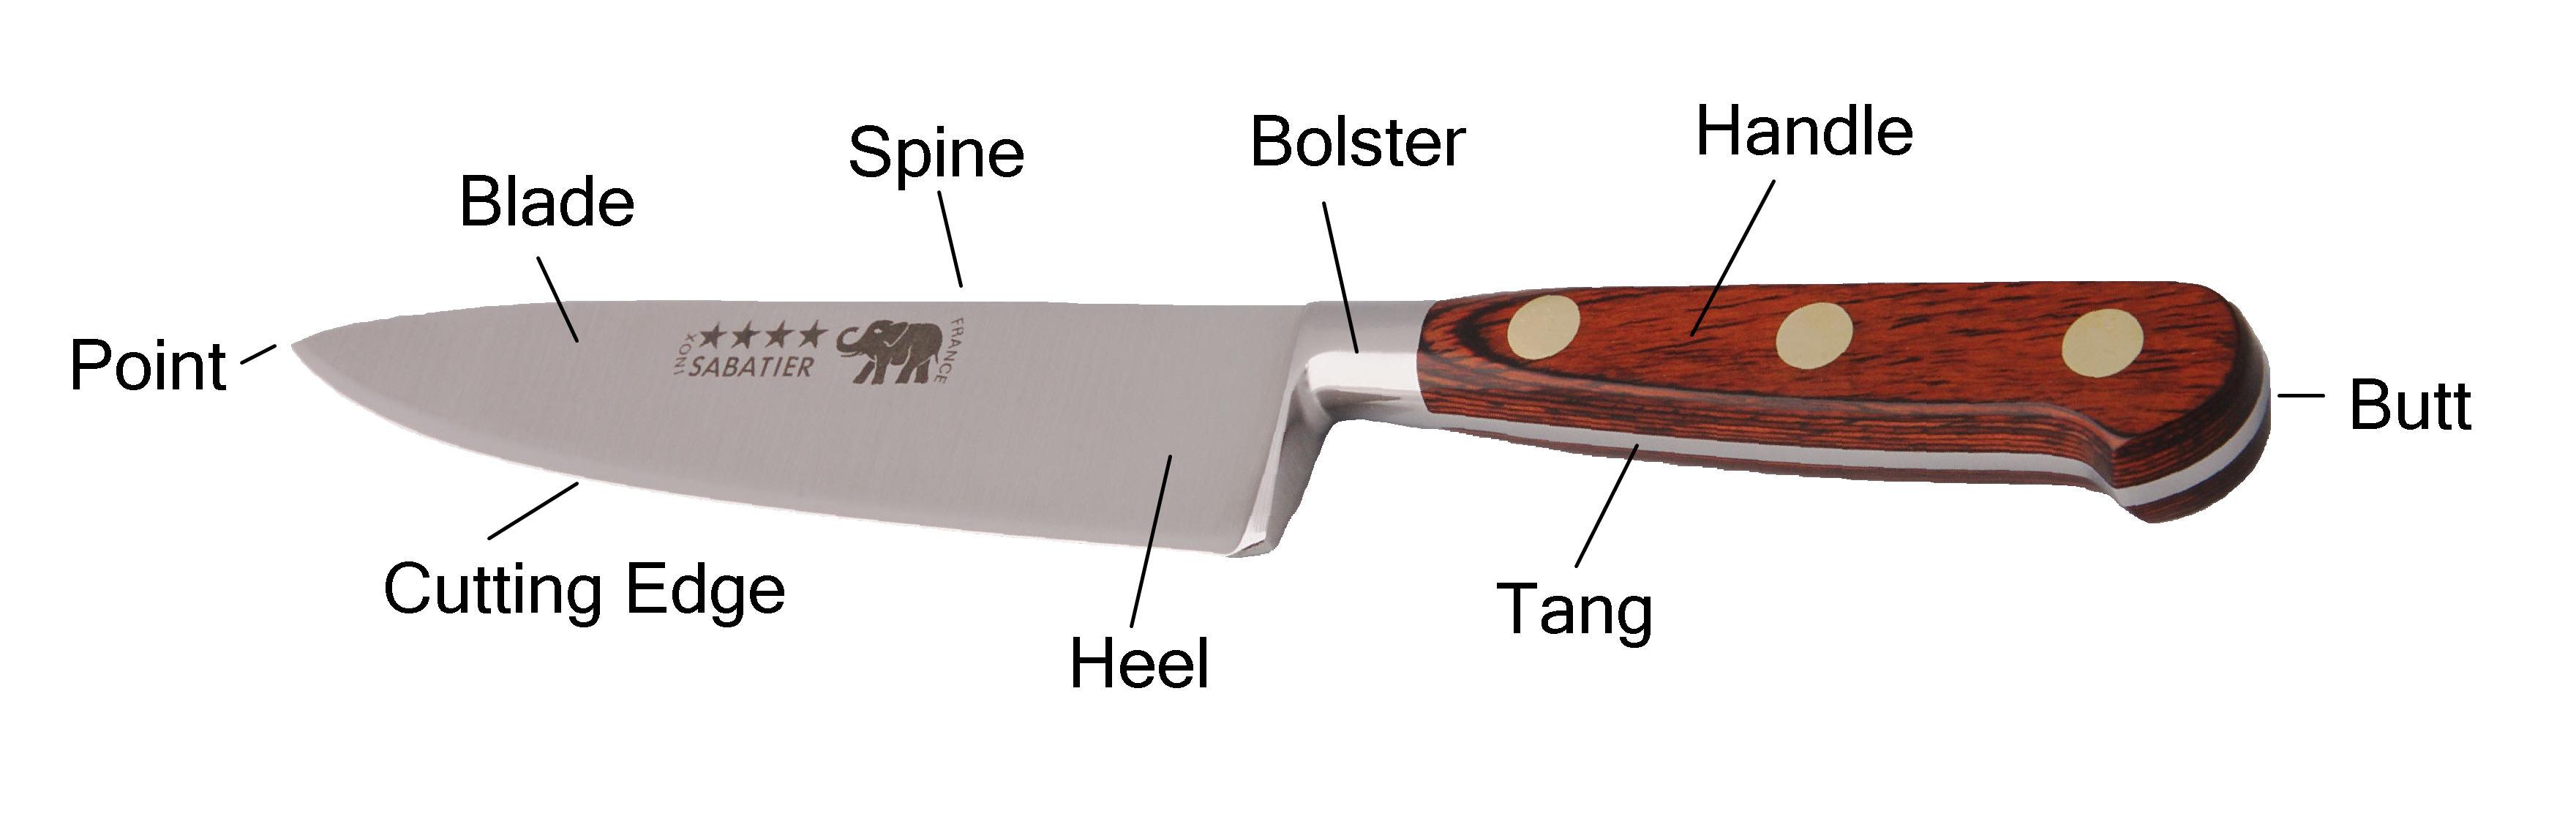 Tips And Techniques Sabatier Knife Shop